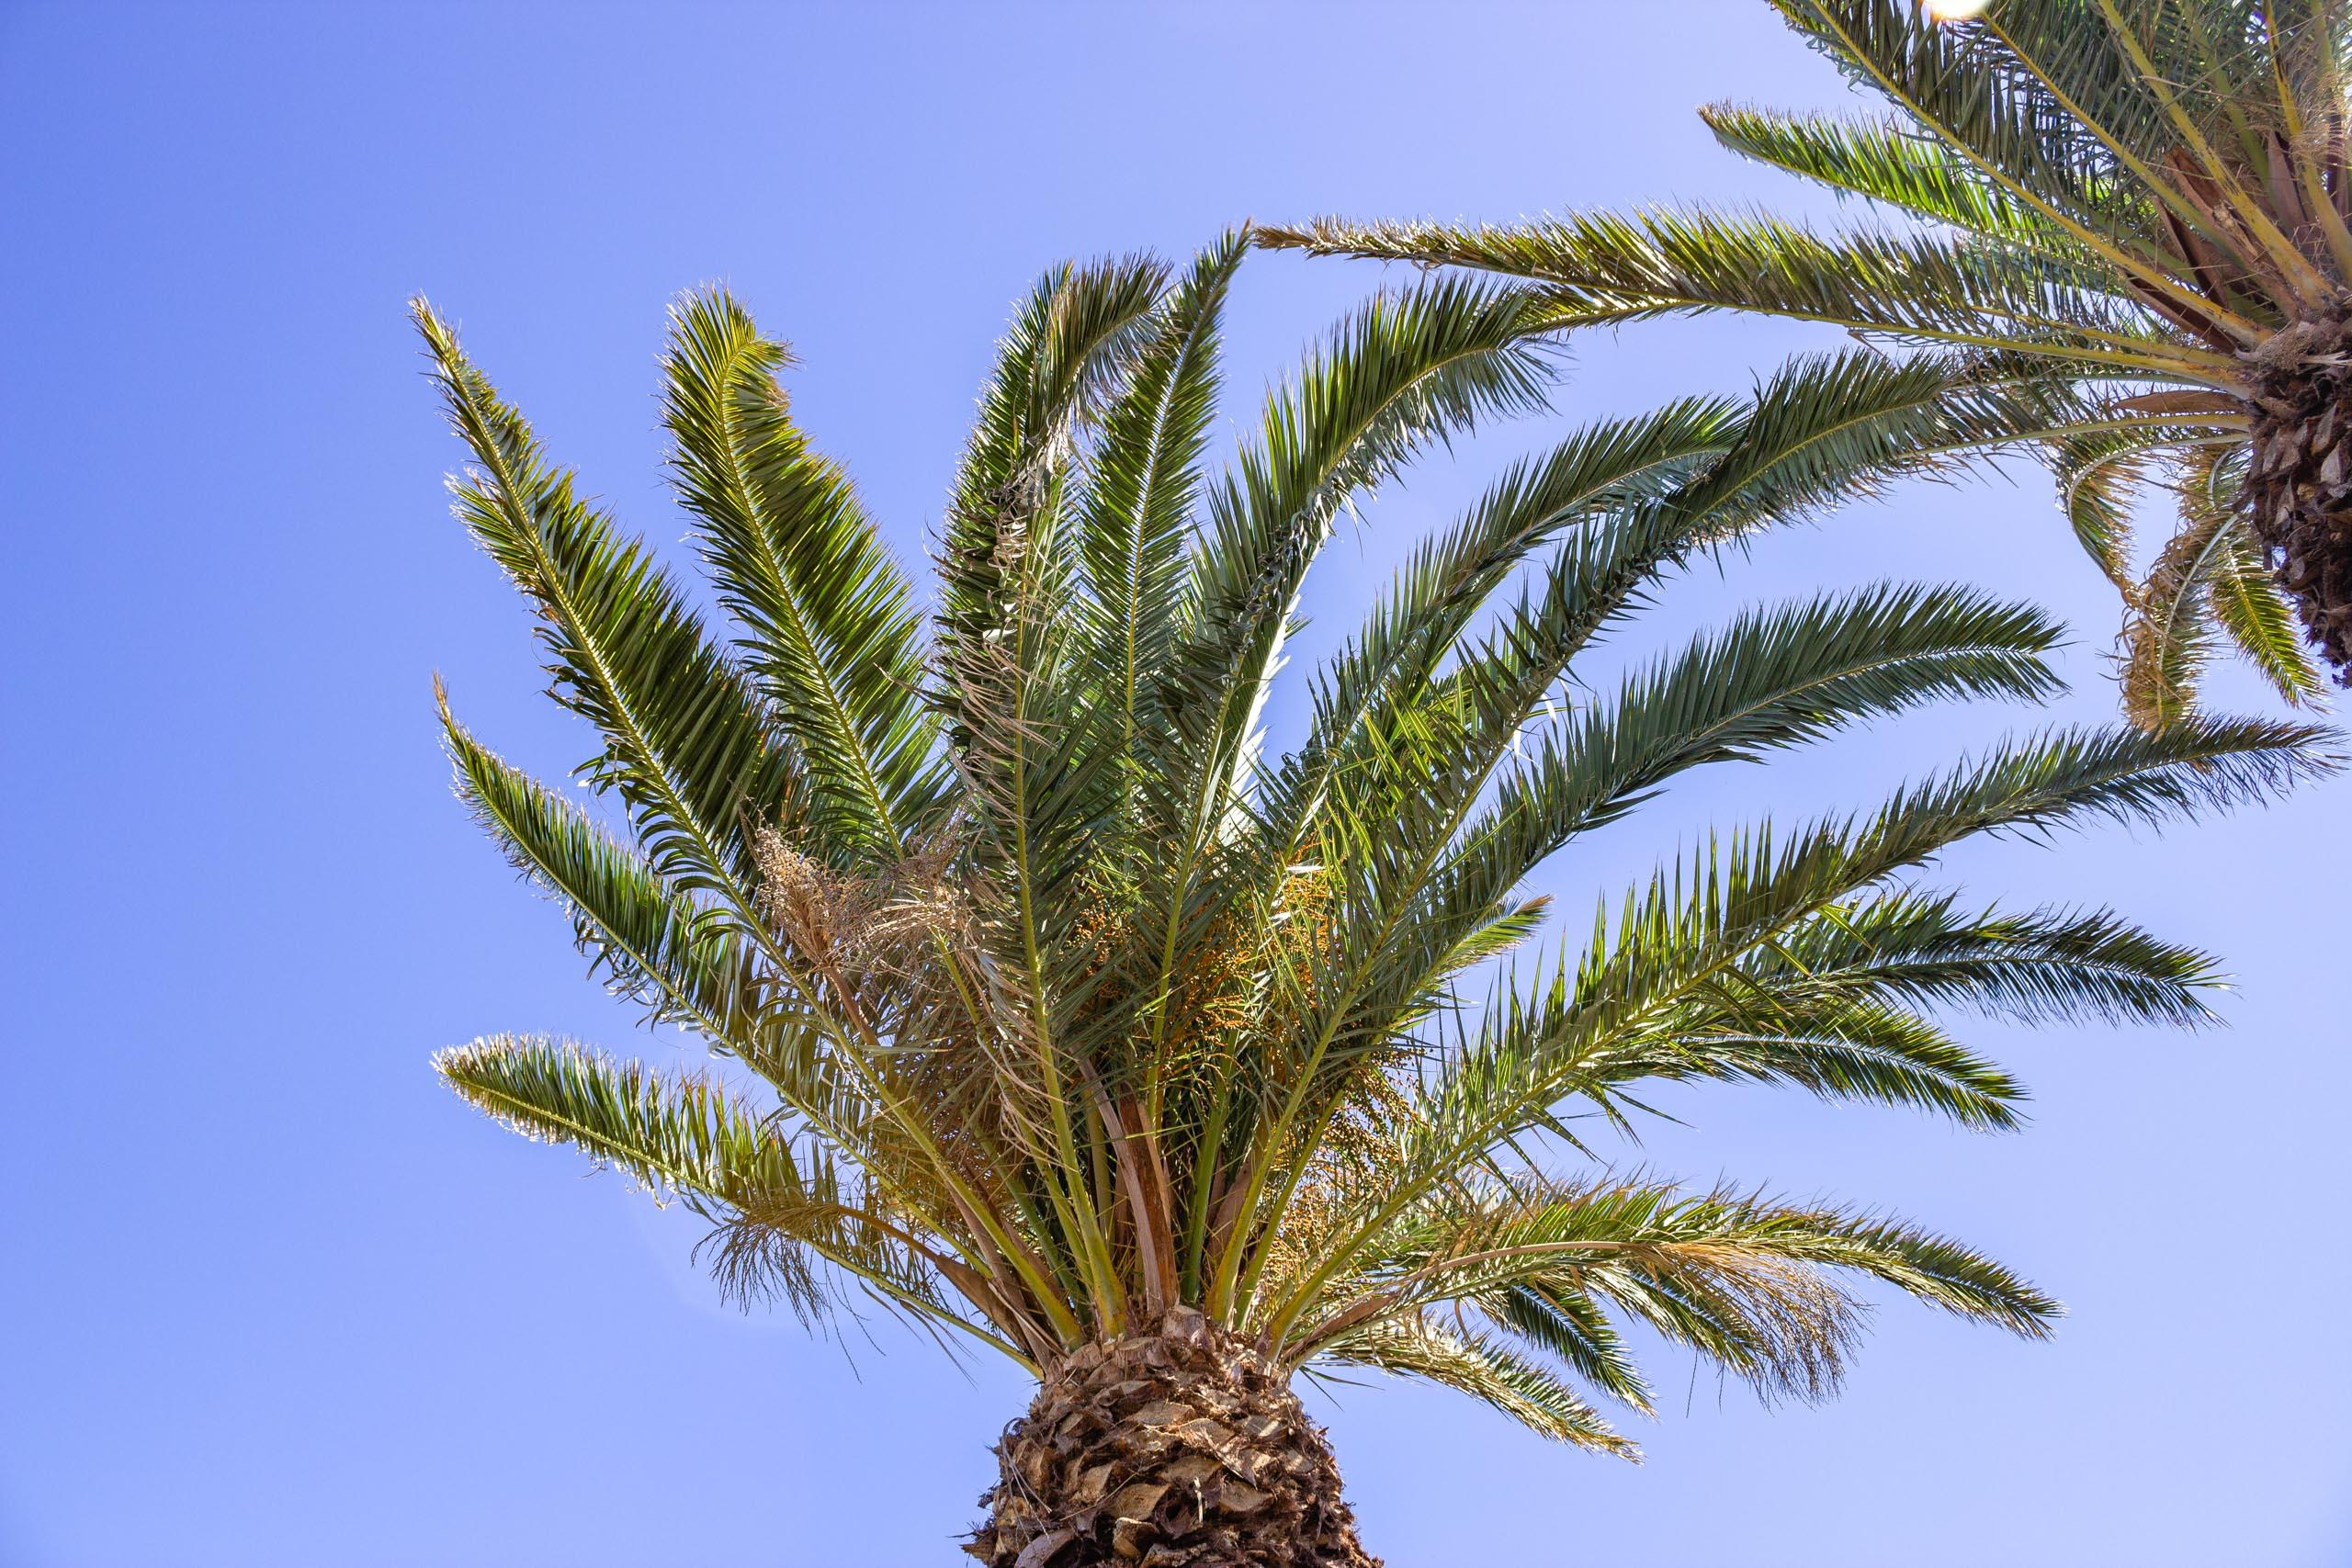 2015 09 Lanzarote PalmTrees 002